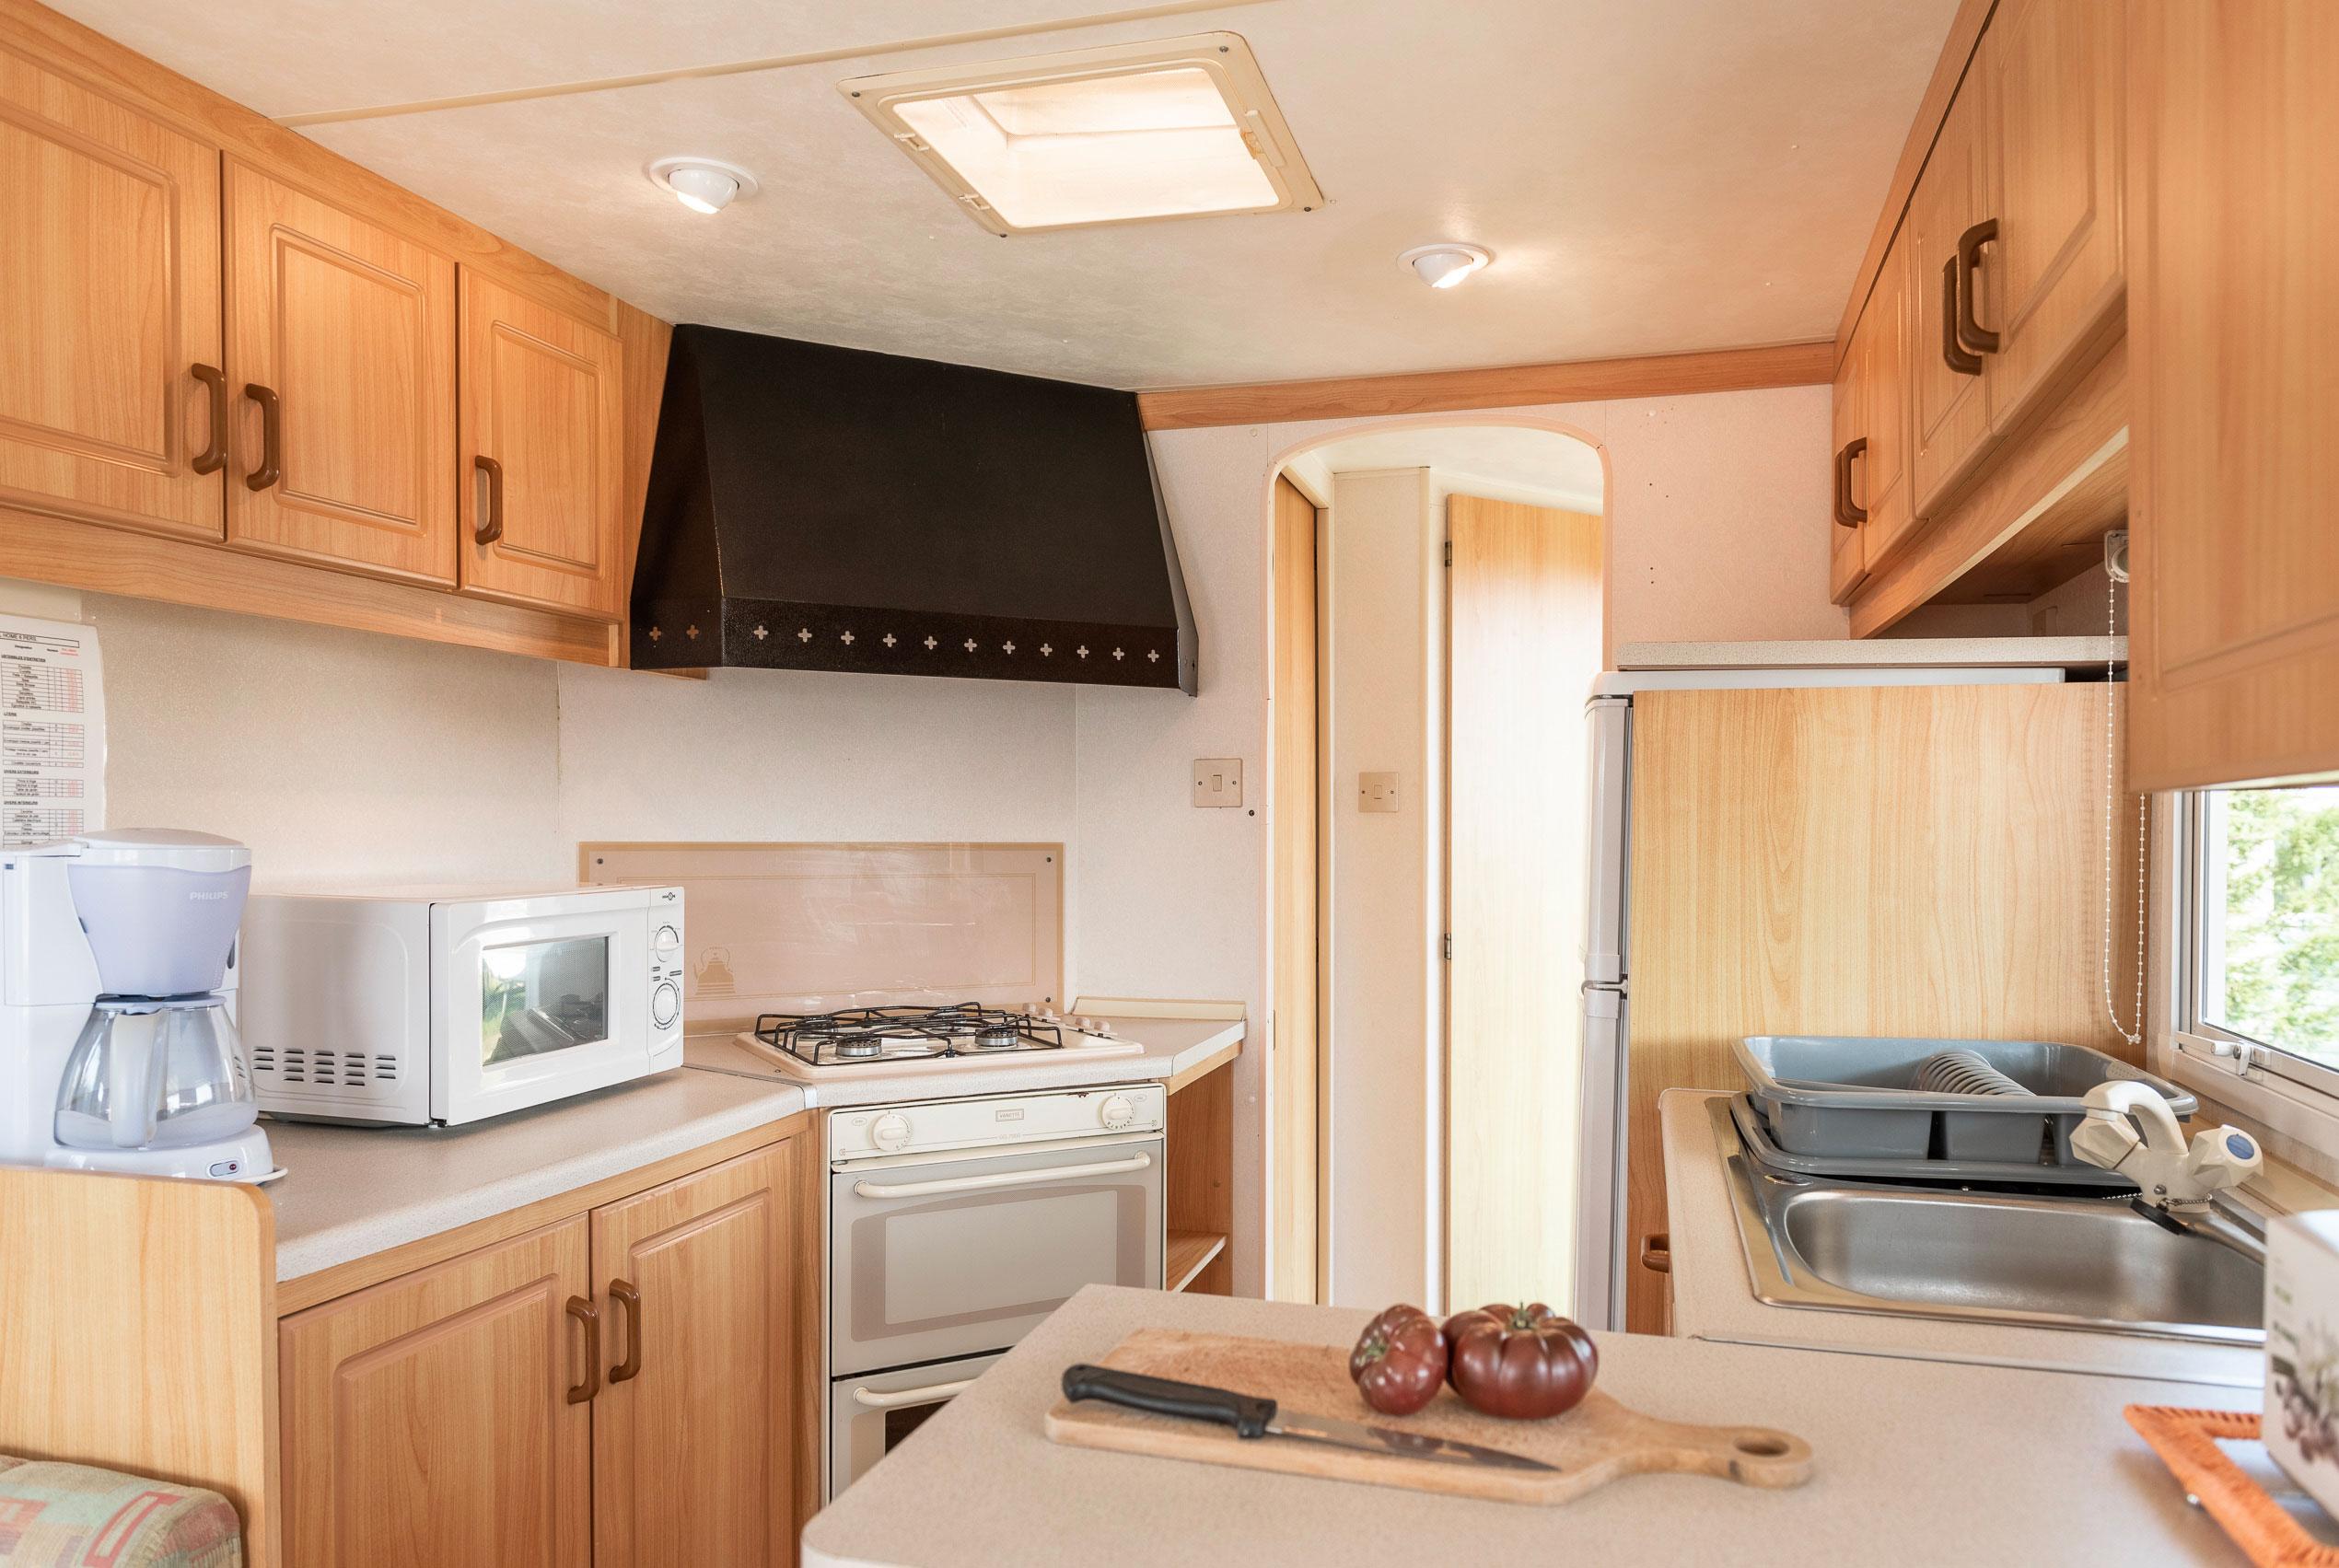 location-mobil-home-6-8-personnes-eco-cuisine-equipee-camping-le-port-de-moricq